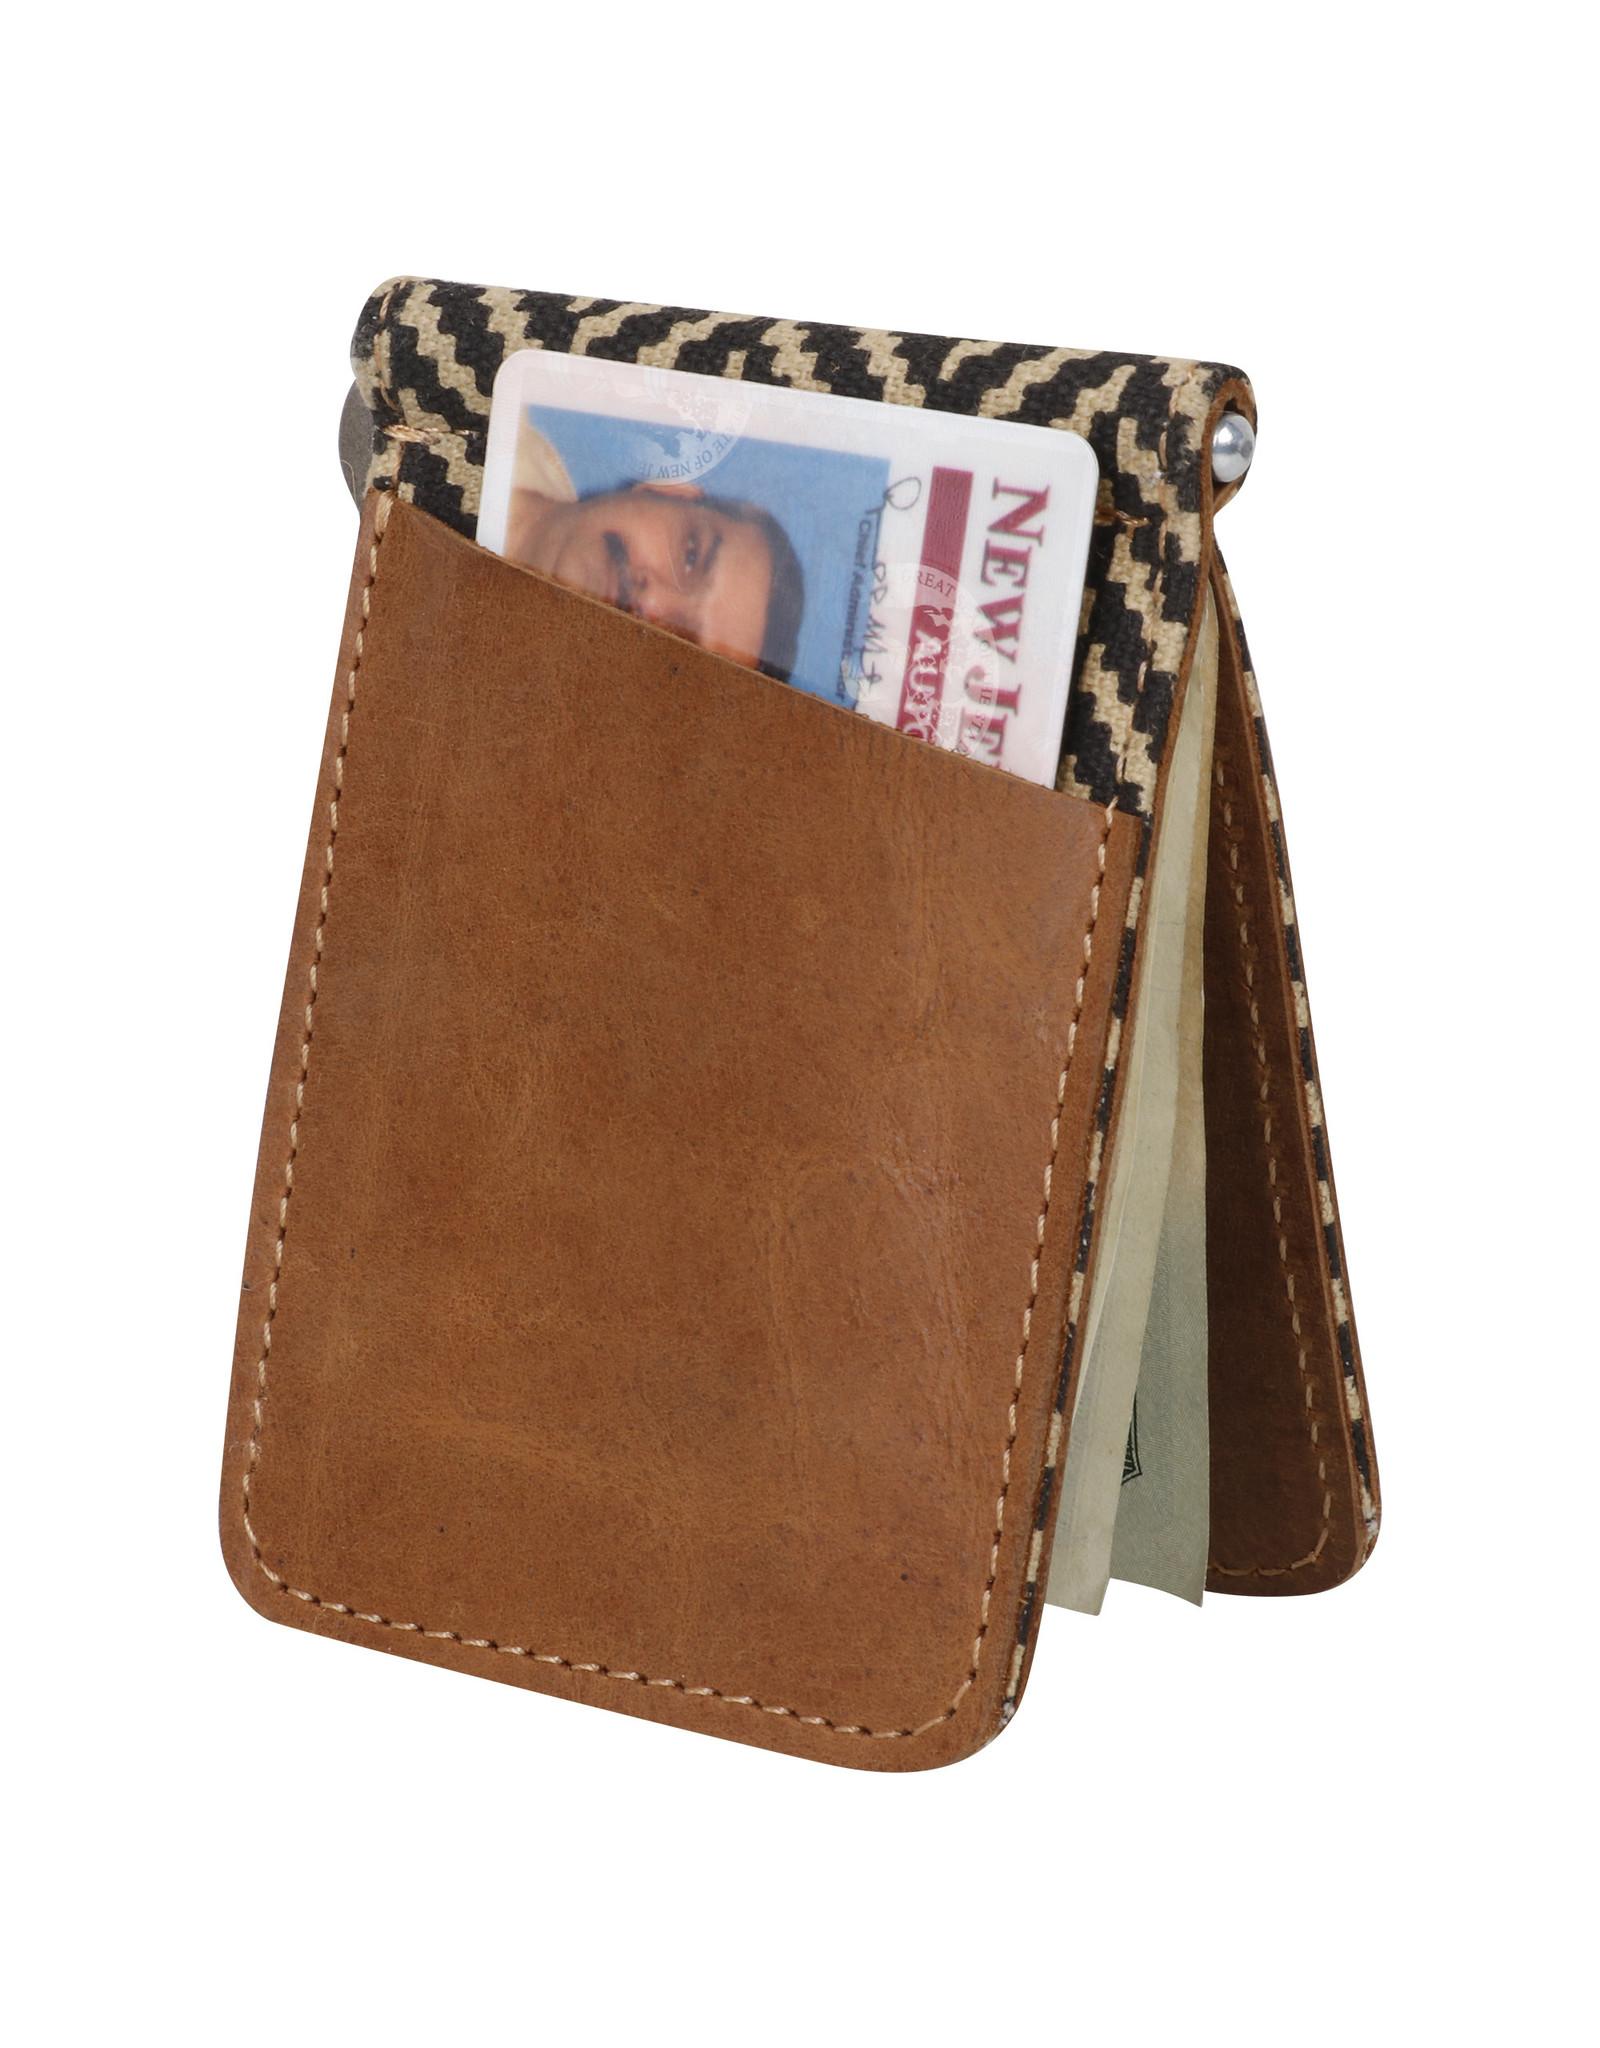 Vann & Co VG1025-P27 RFID Money Clip